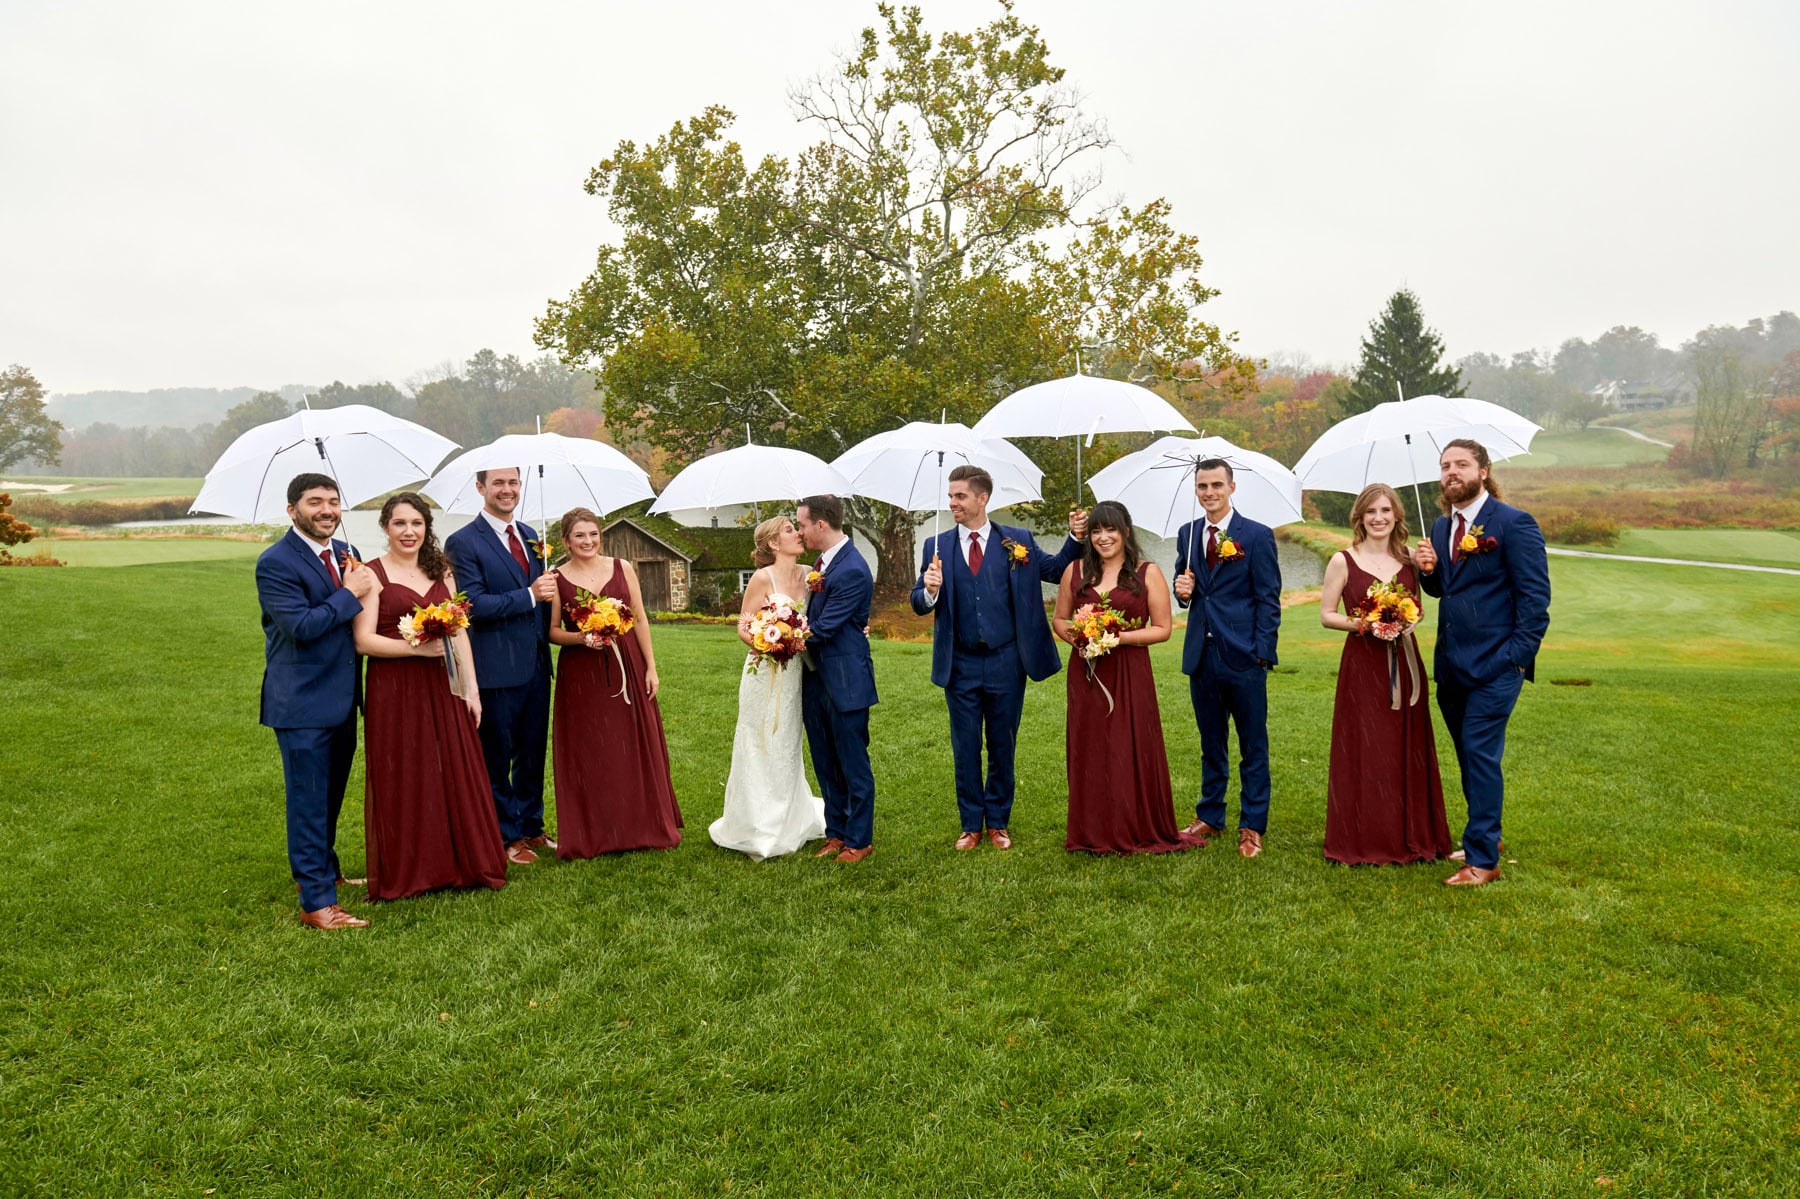 rainy day wedding photo at French Creek Golf Club